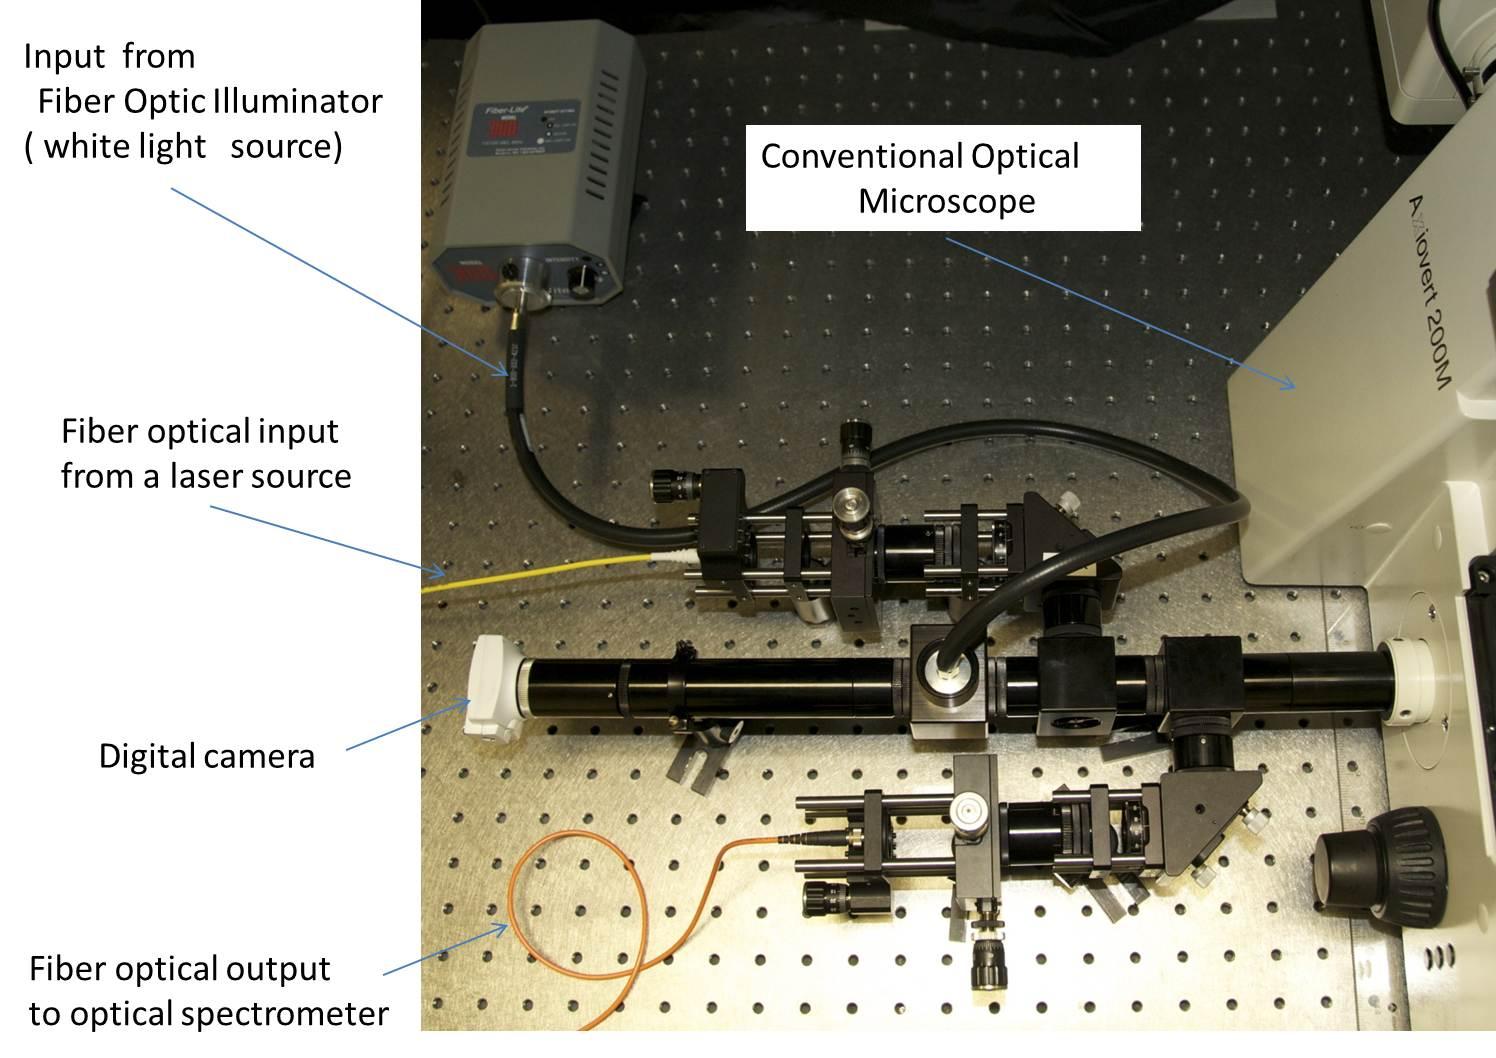 Acto A Adapter Actoprobe Fiber Optic Probe Diagram Optical Schematic